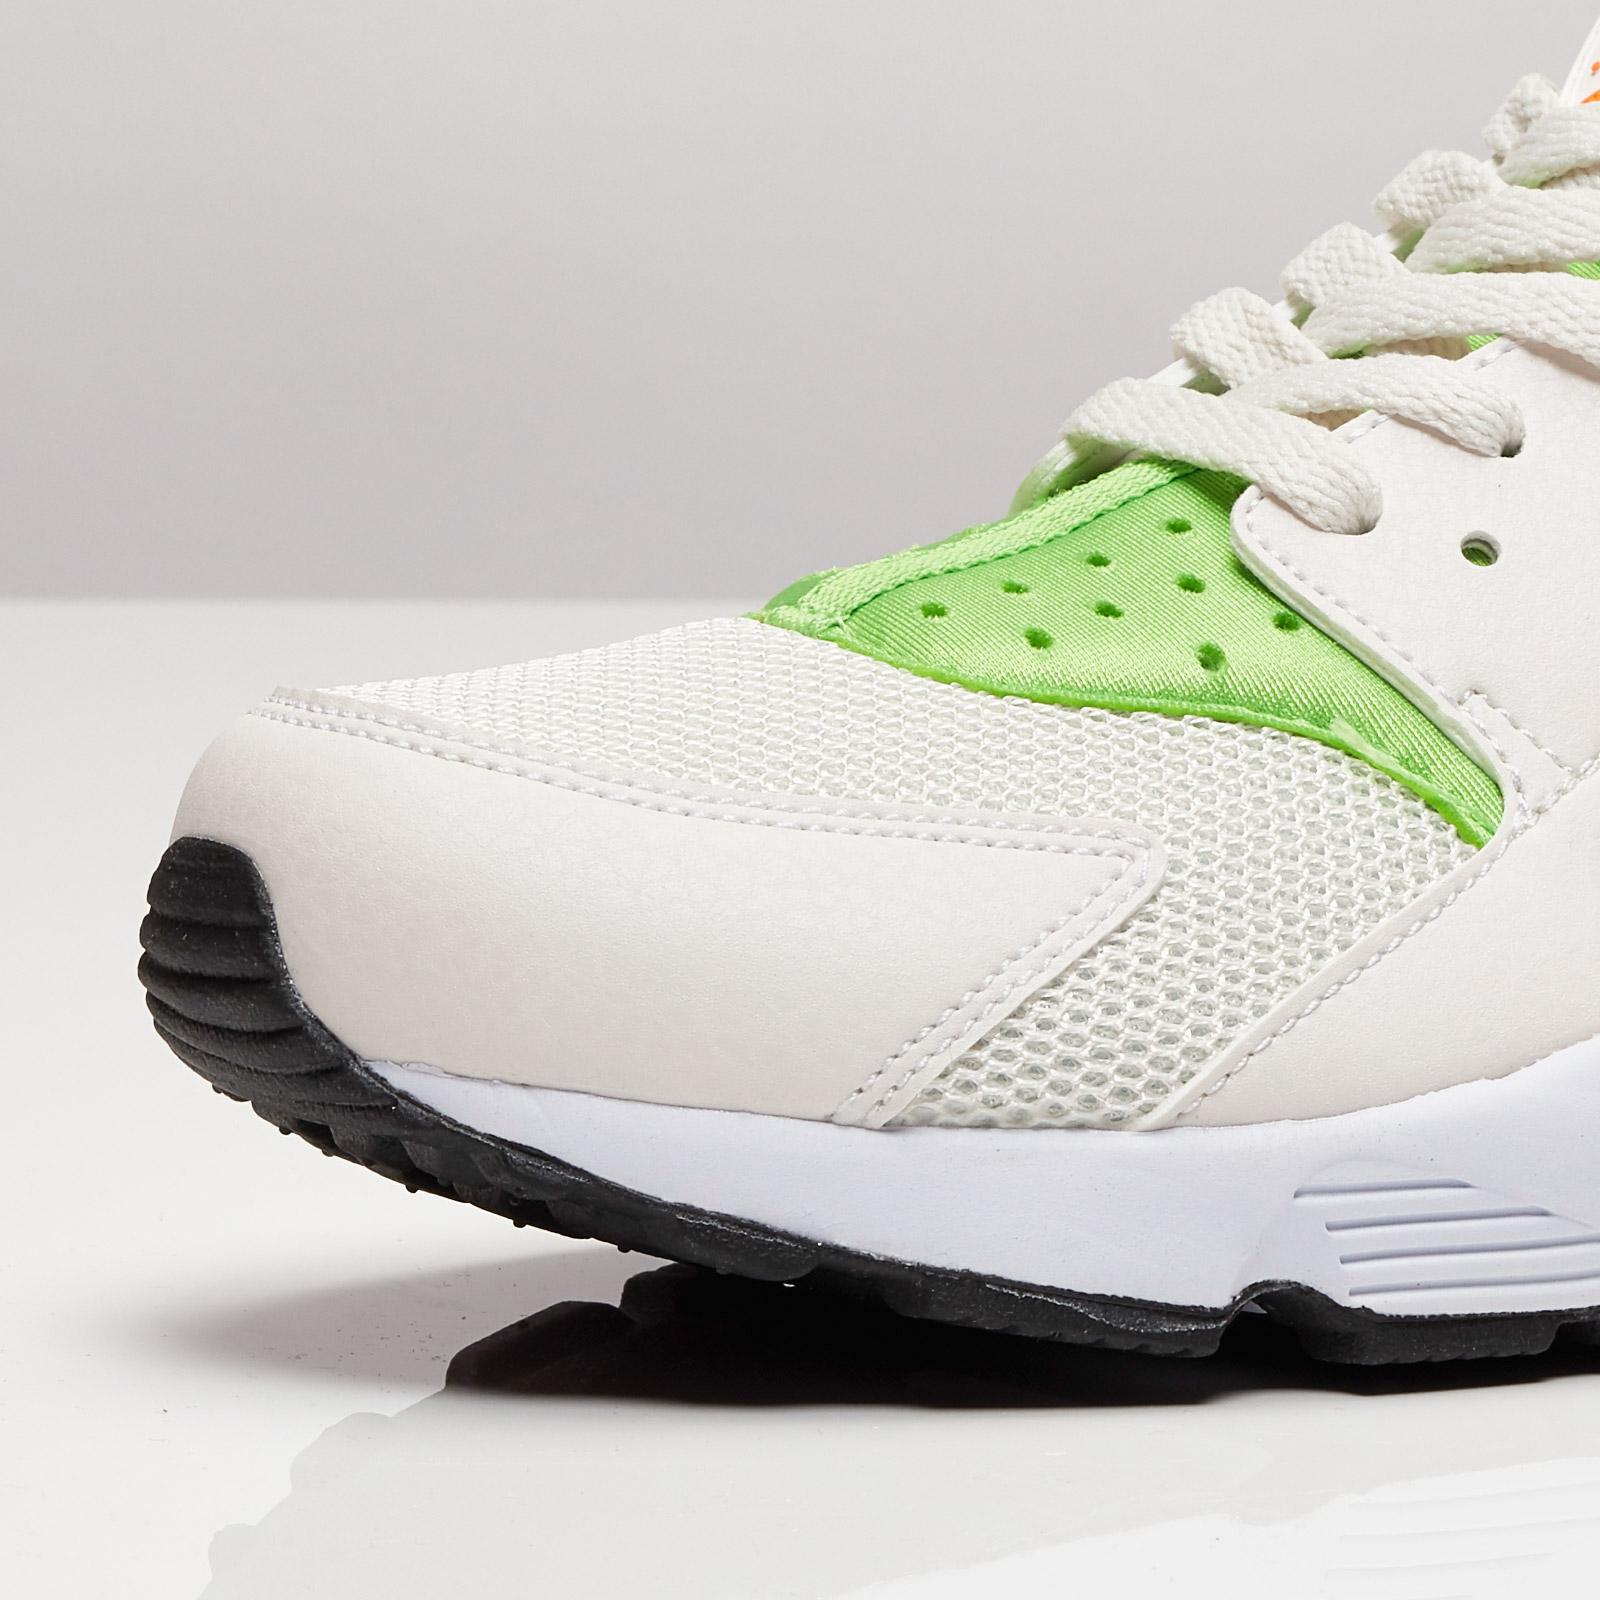 943f4b07b751 Nike Air Huarache - 318429-304 - Sneakersnstuff